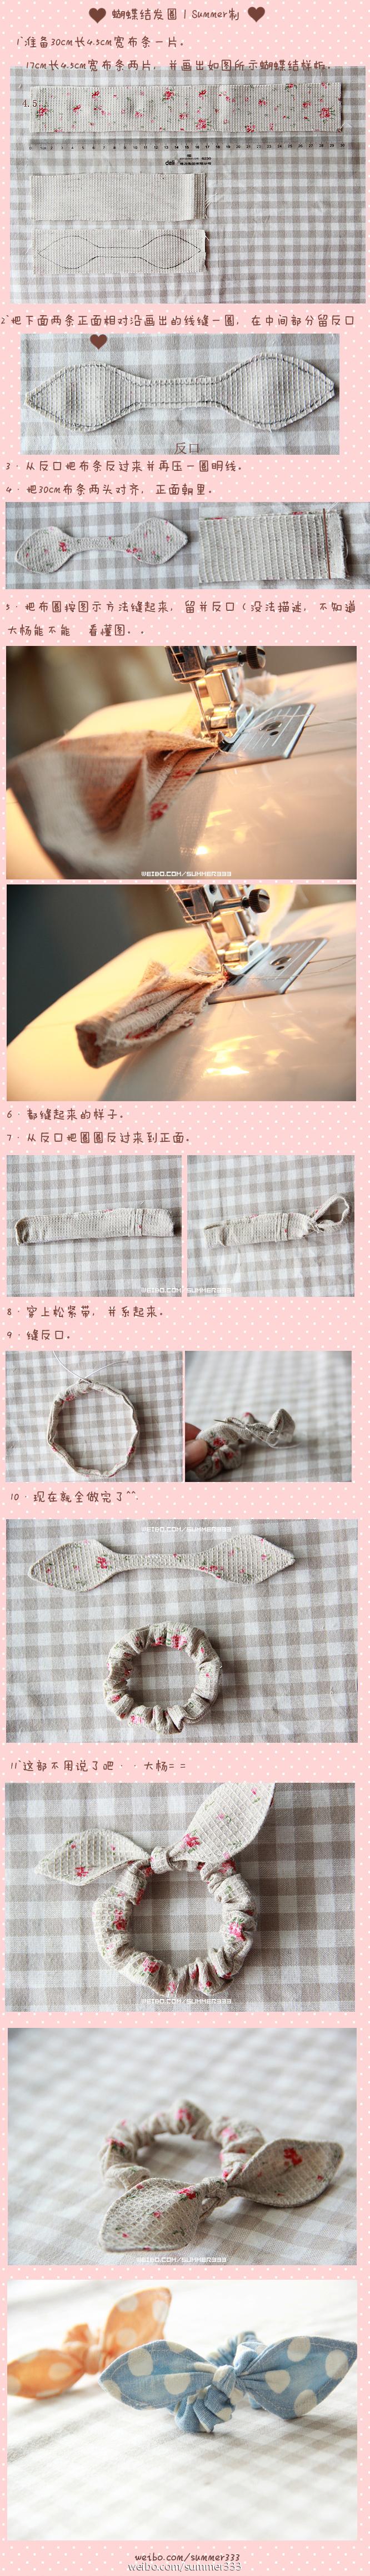 http://img2.duitang.com/uploads/item/201208/05/20120805175716_VZHJE.jpeg